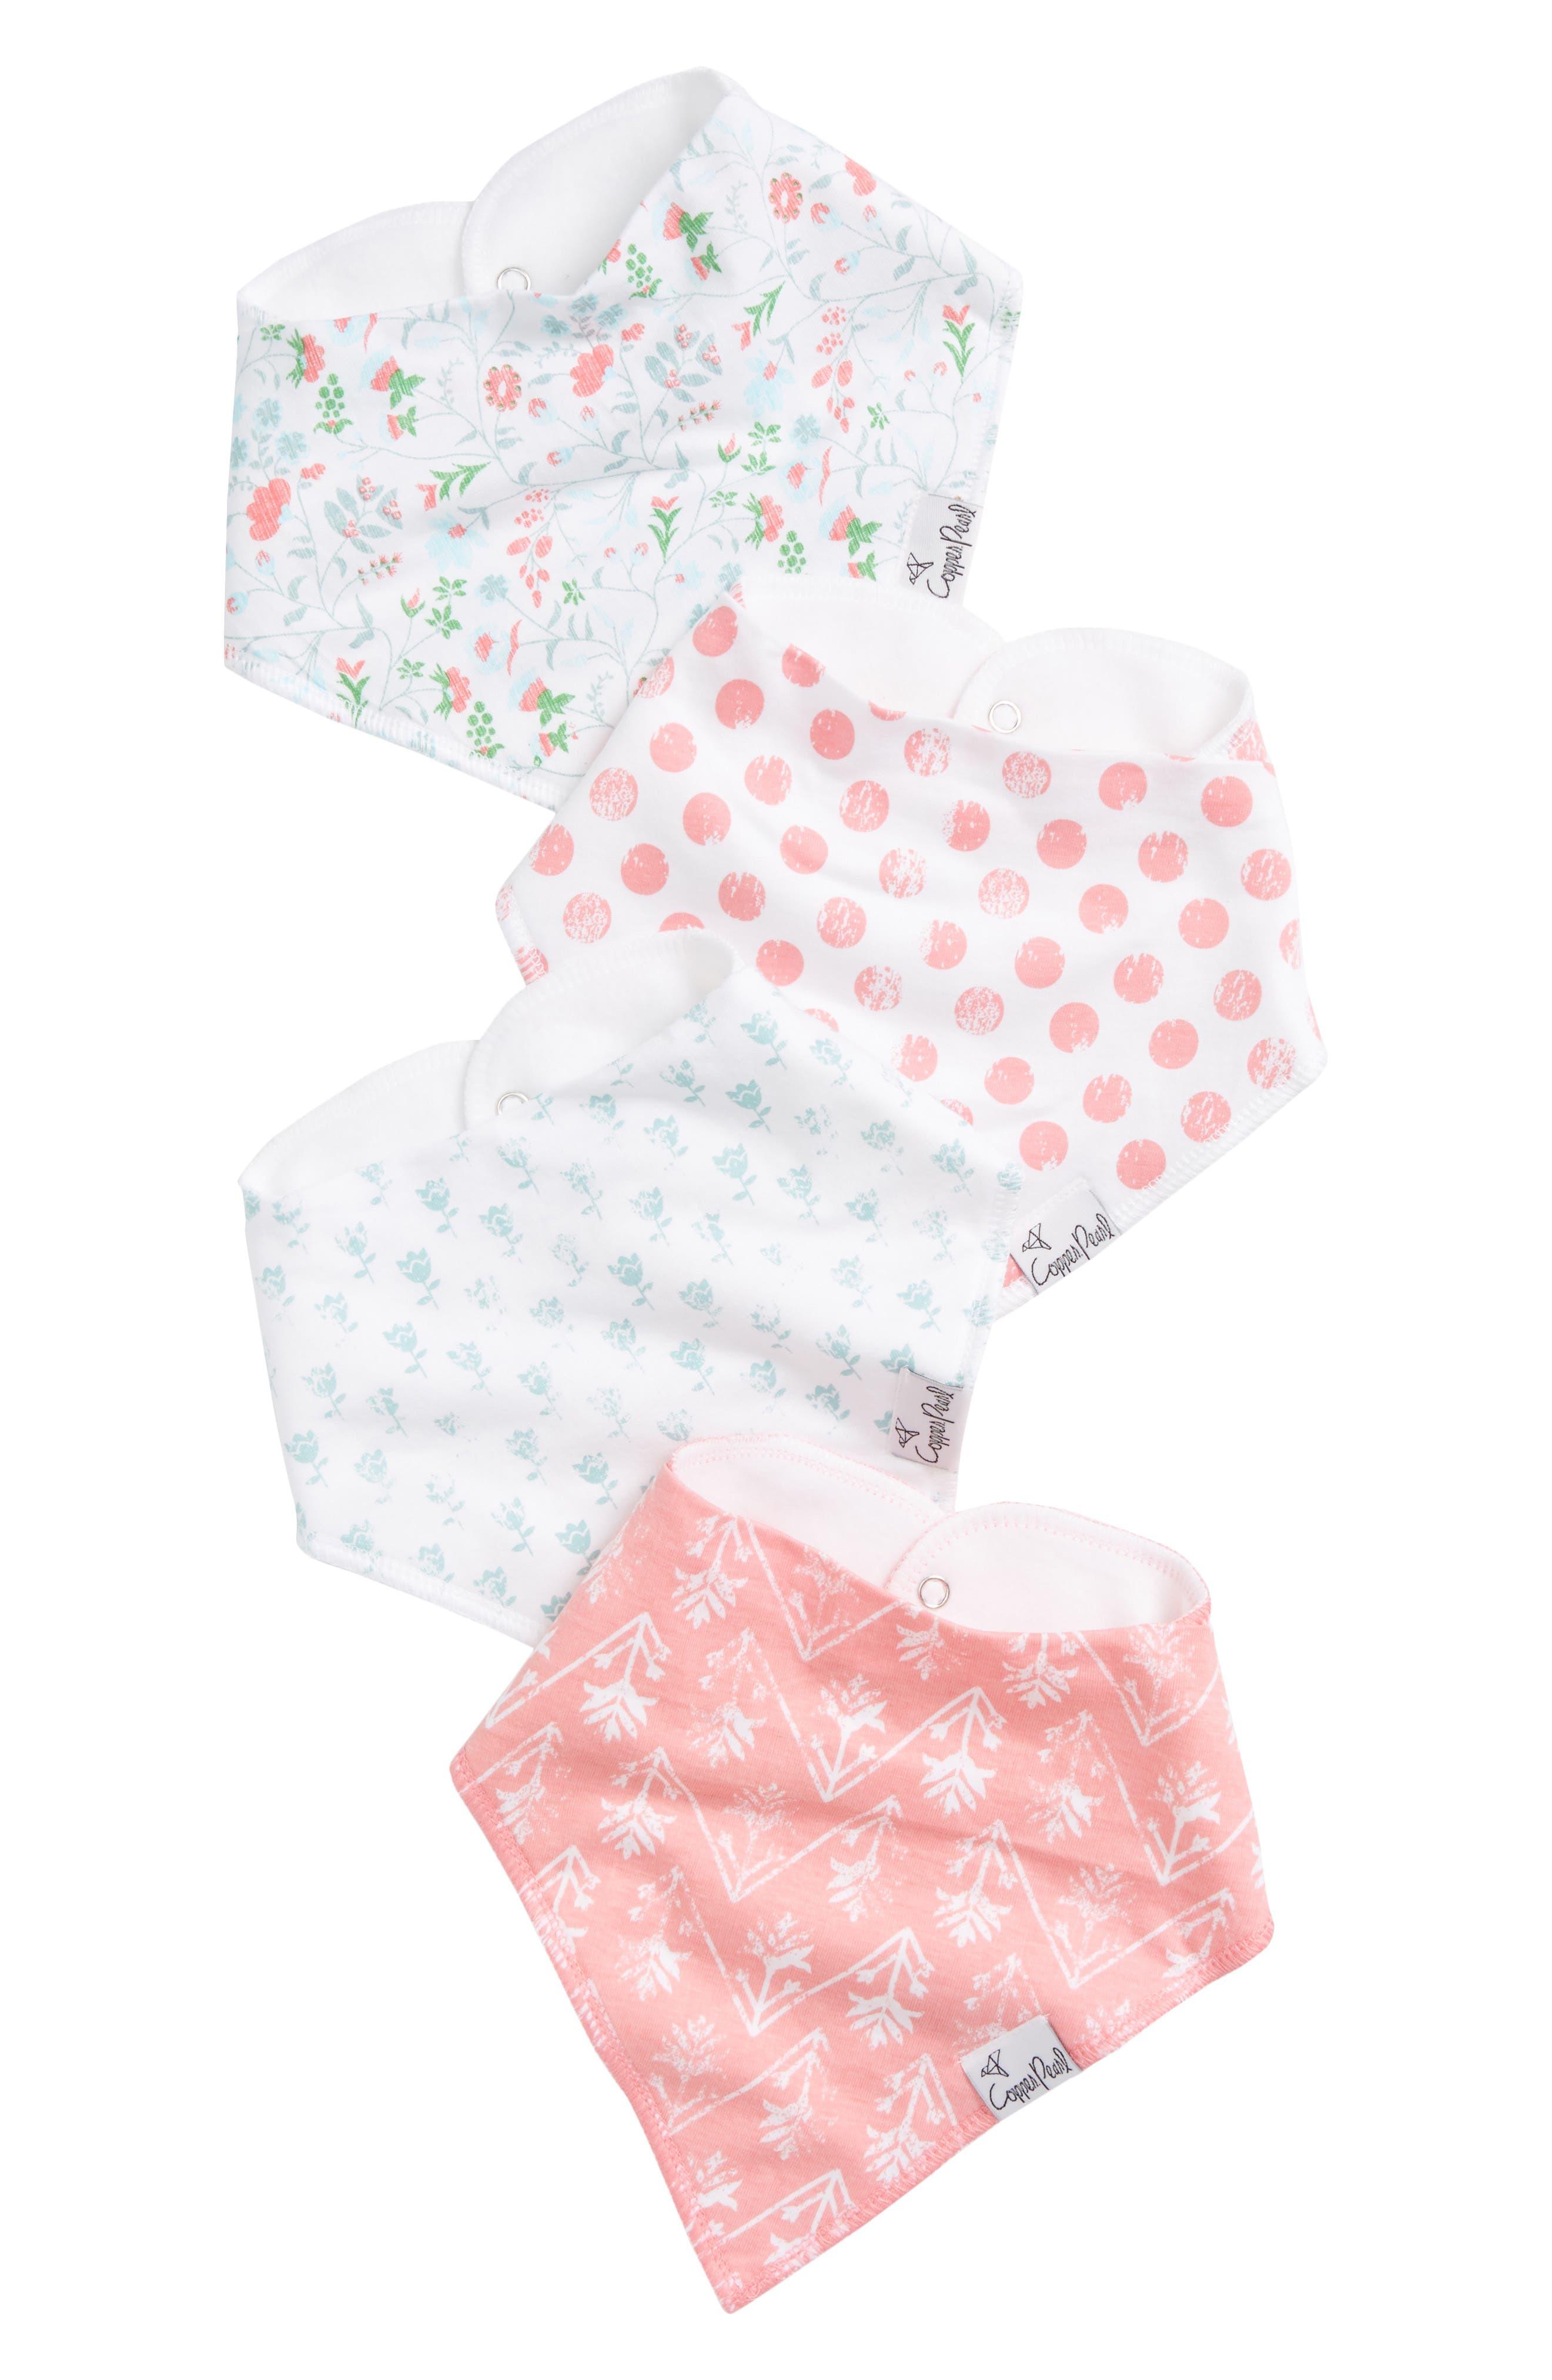 Alternate Image 1 Selected - Copper Pearl 4-Pack Bandana Bibs (Baby)